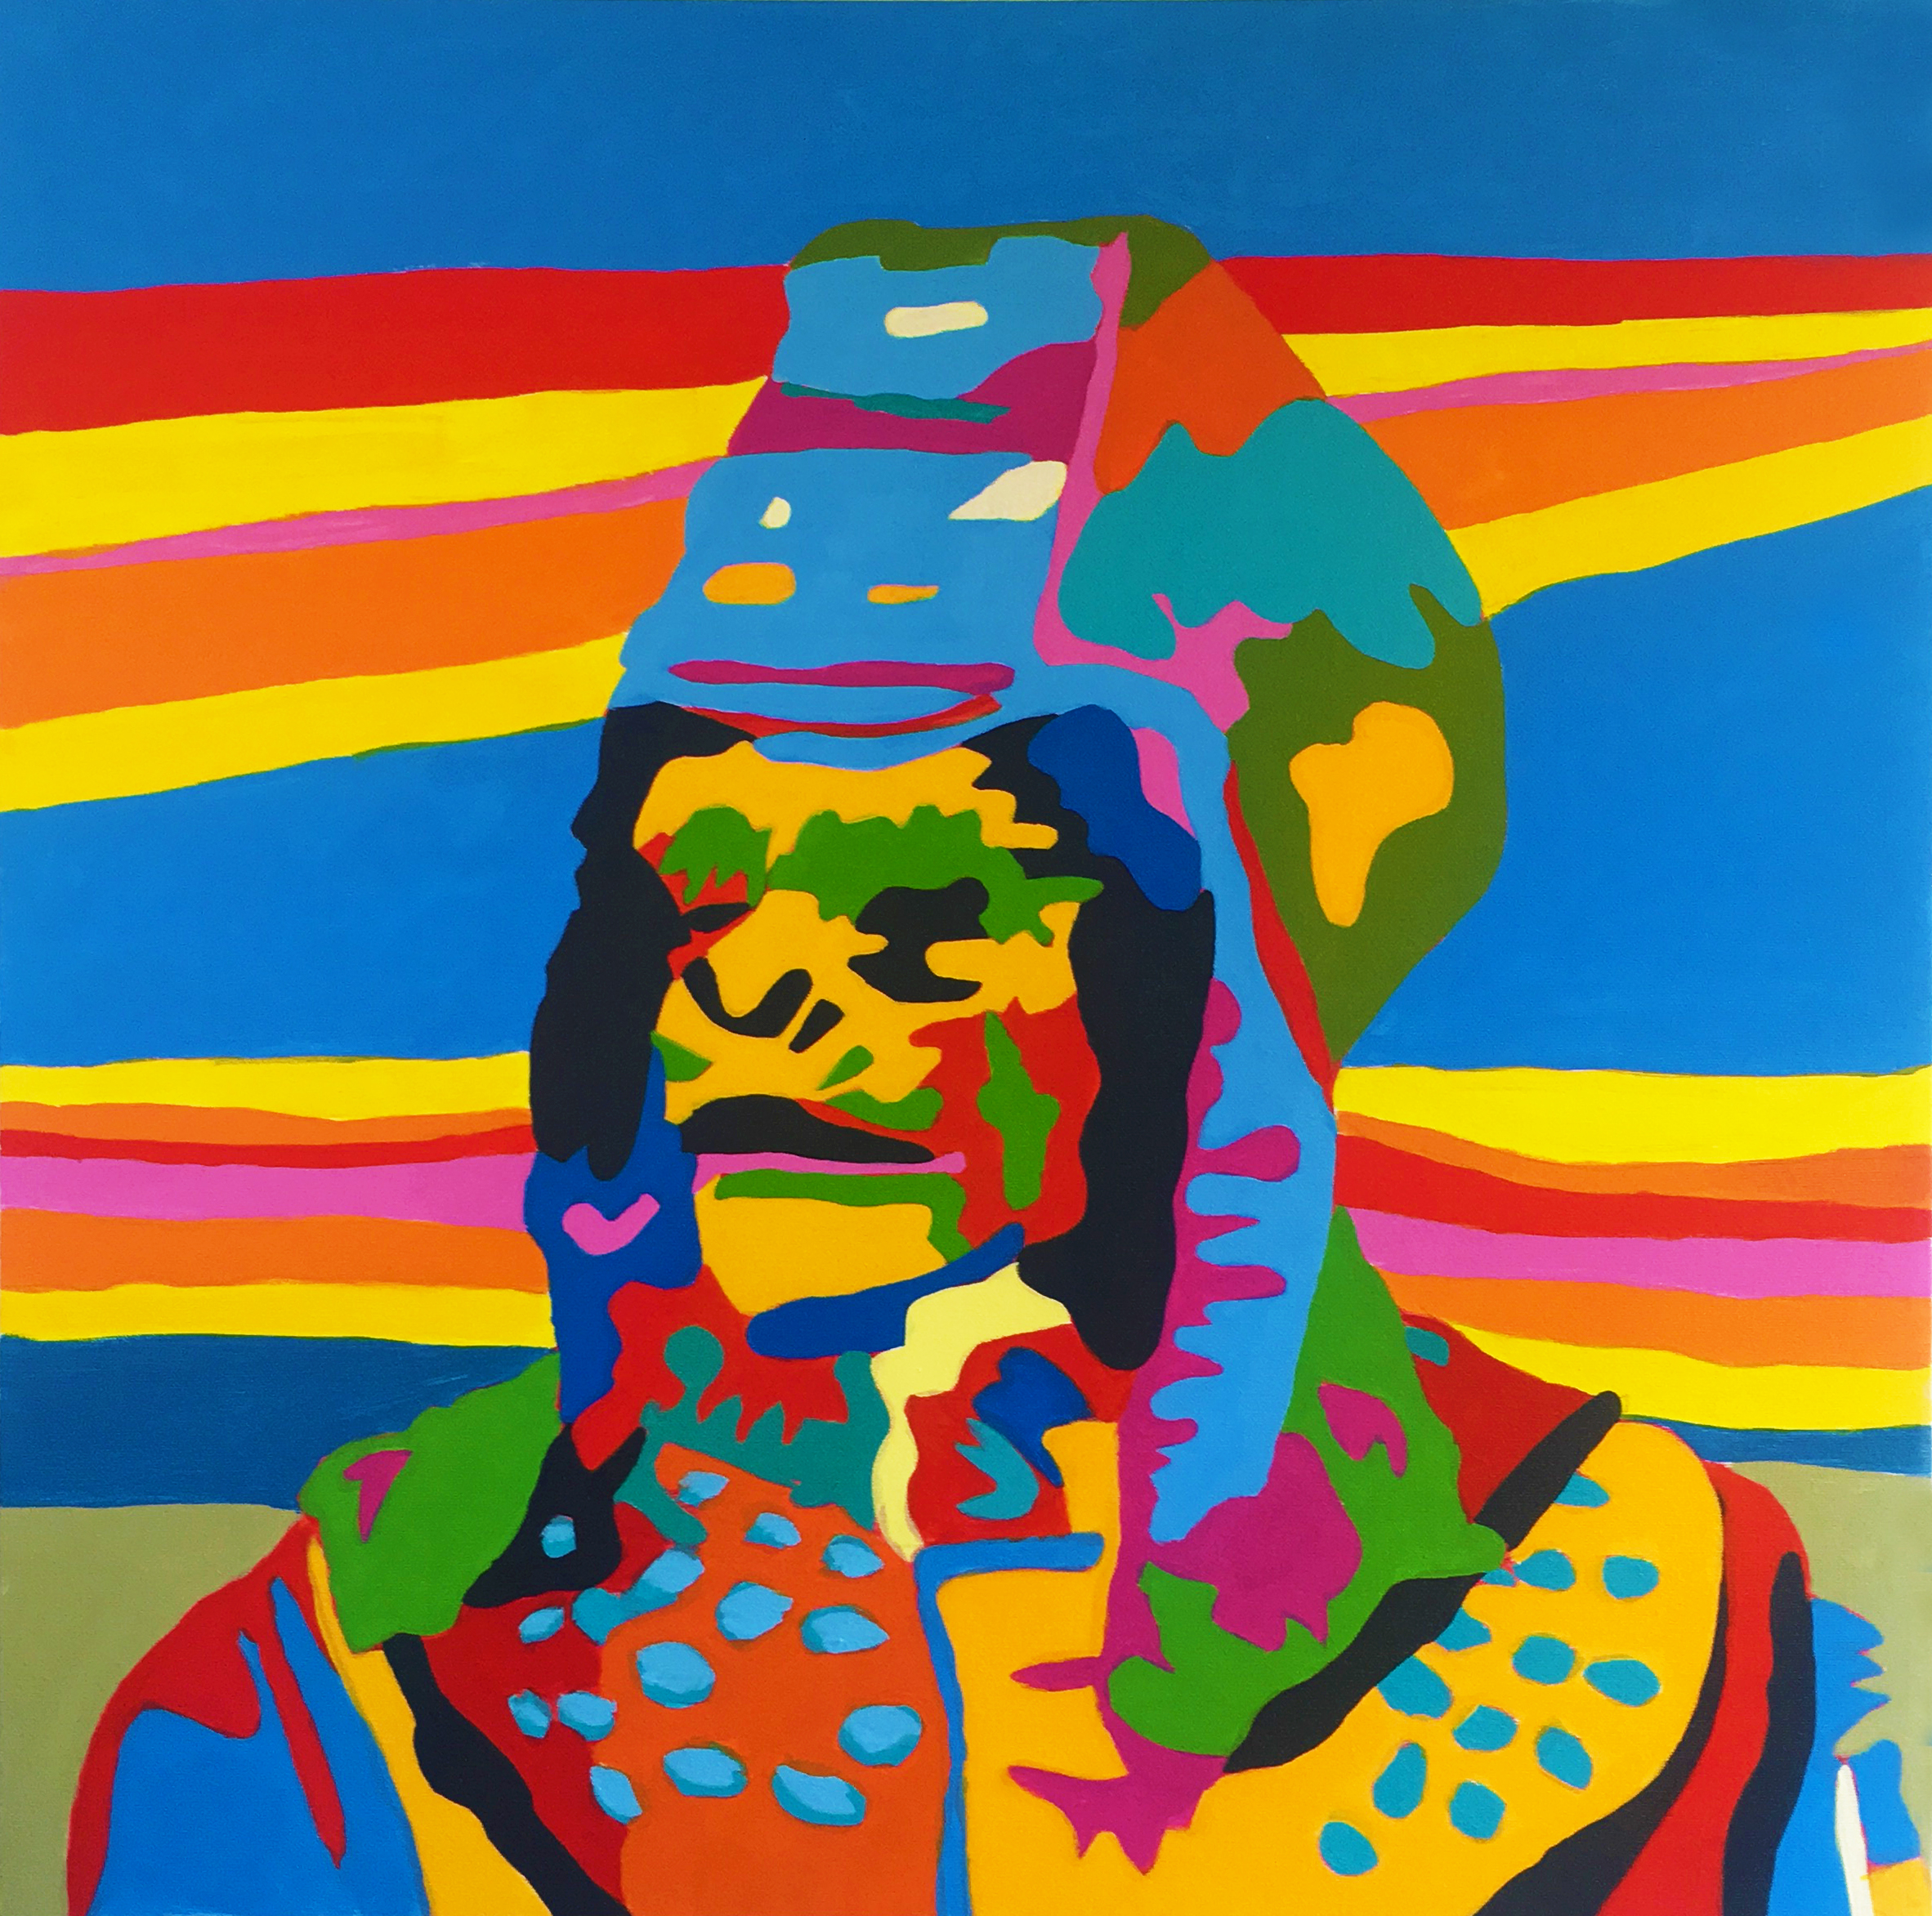 Urko Considers a Coup D'etat  24x24 inches Acrylic on canvas